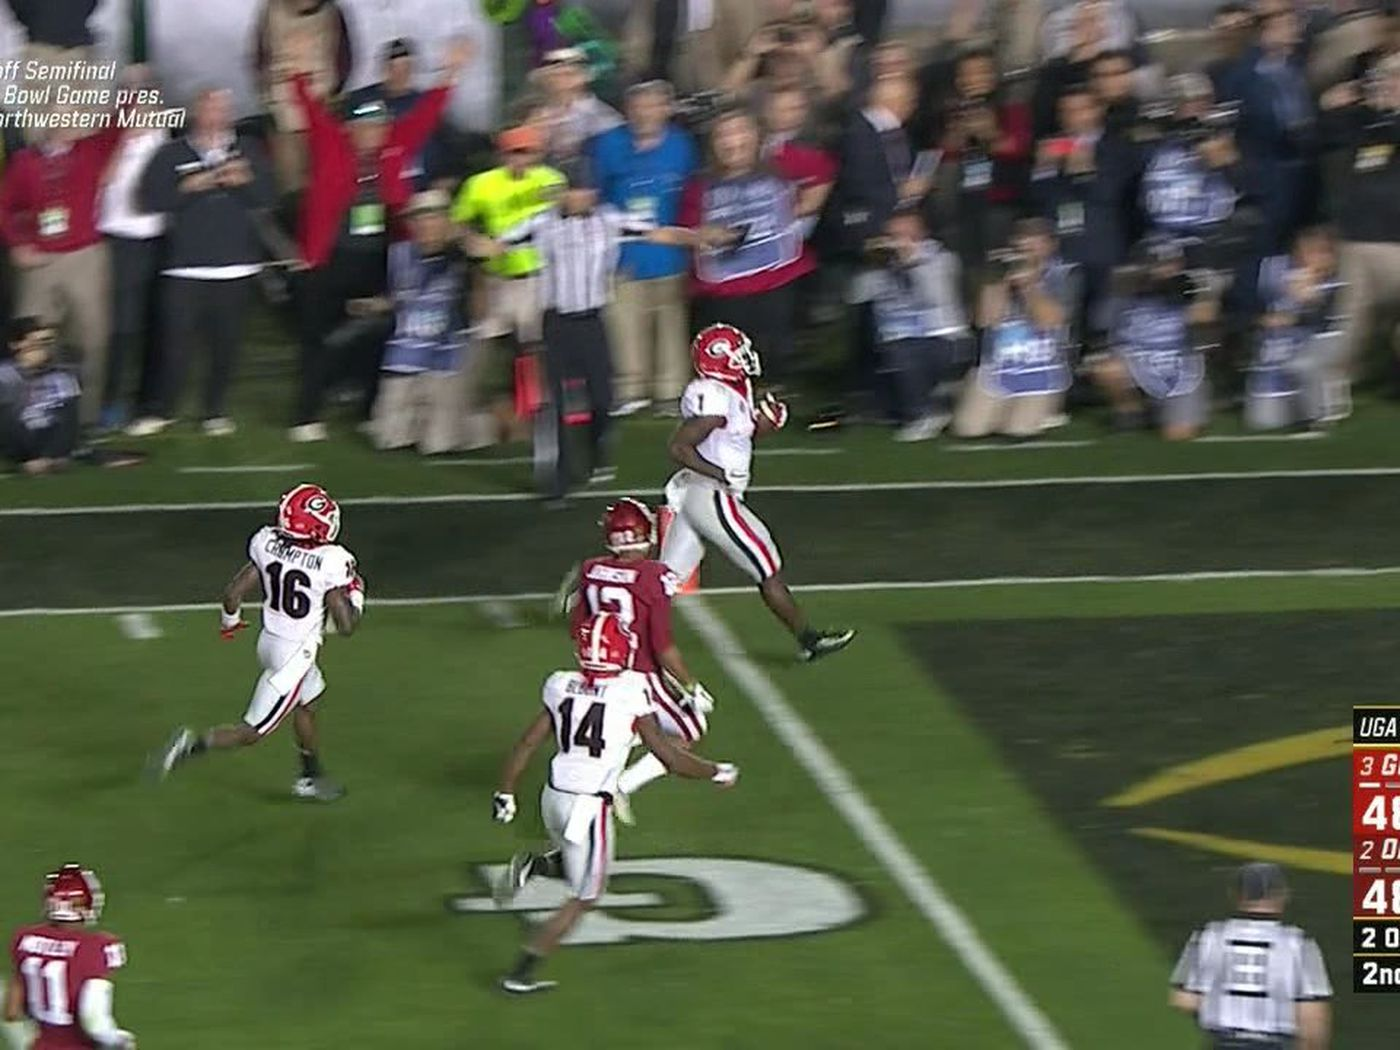 Georgia beats Oklahoma on Sony Michel TD in Rose Bowl semifinal ...